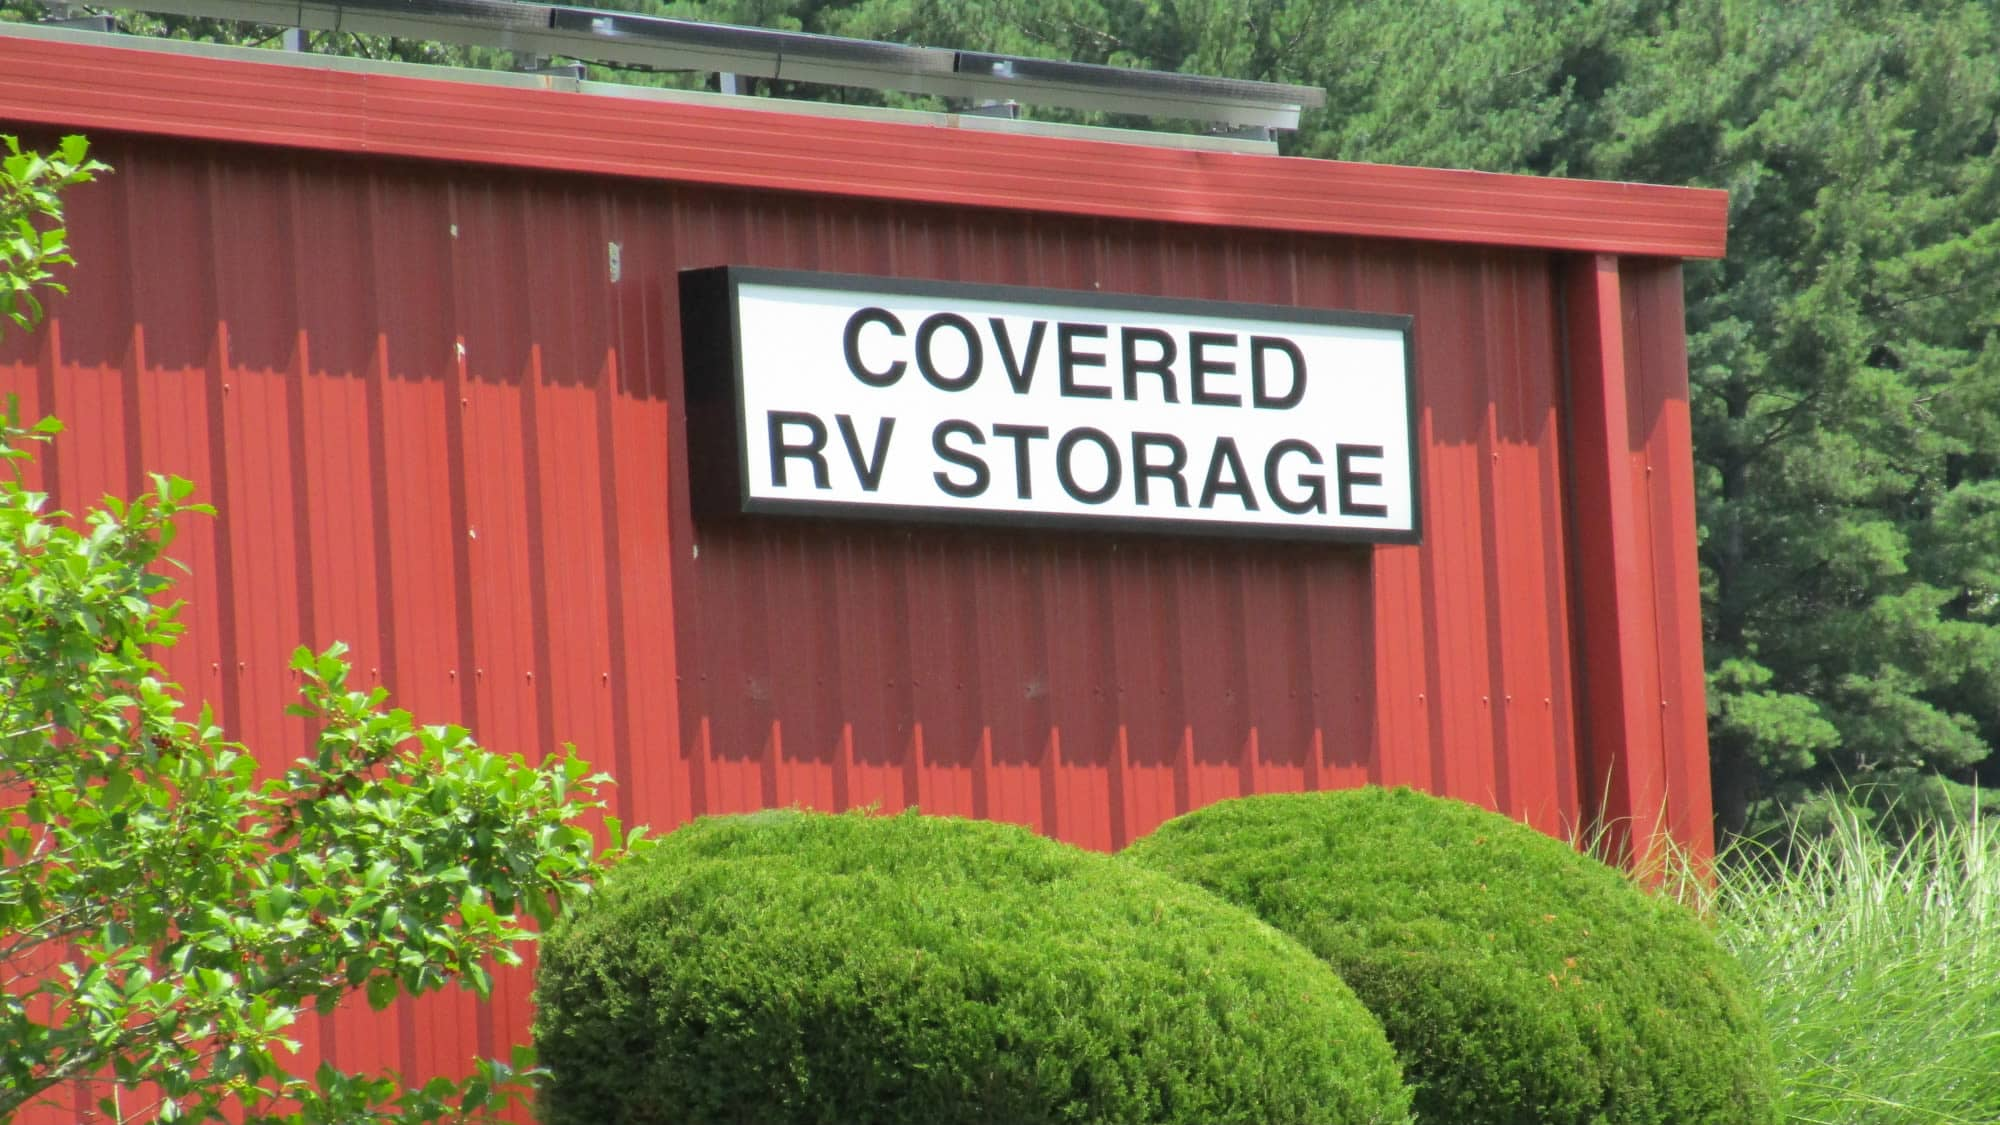 RV storage sign at New Market Mini Storage in New Market, Maryland